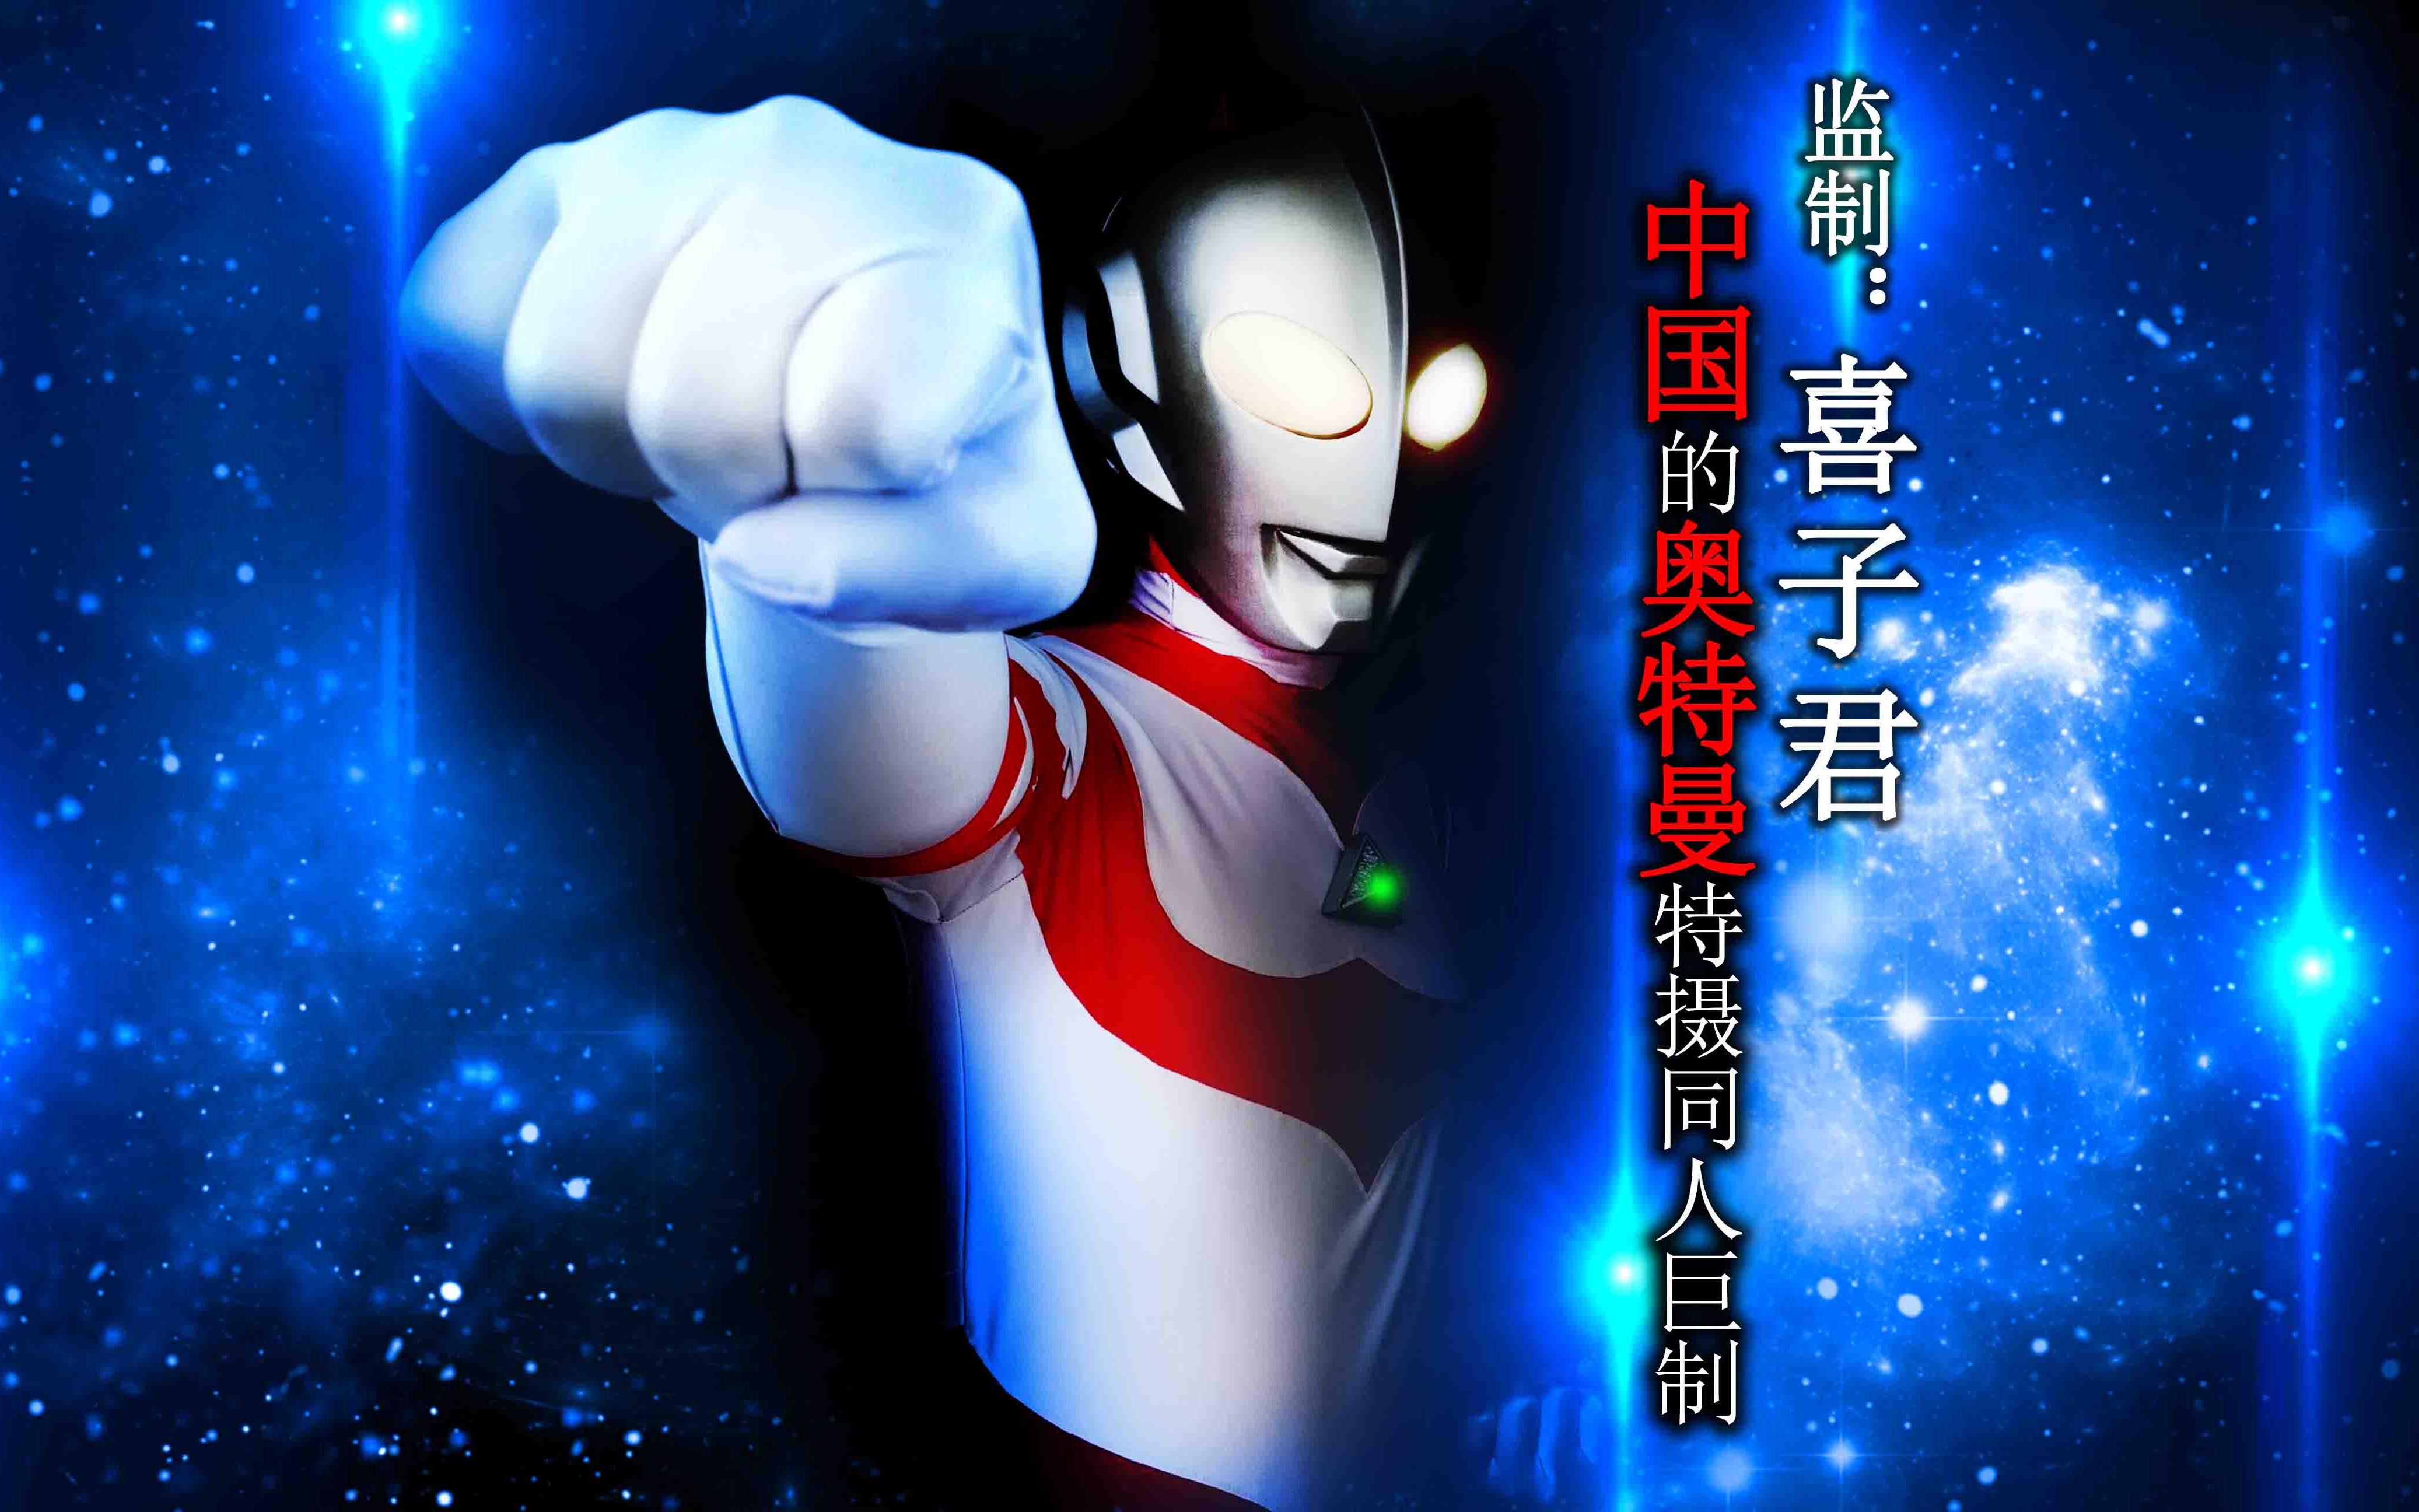 【b站首发】中国版葛雷奥特曼同人巨制!民间版奥特曼VS金刚